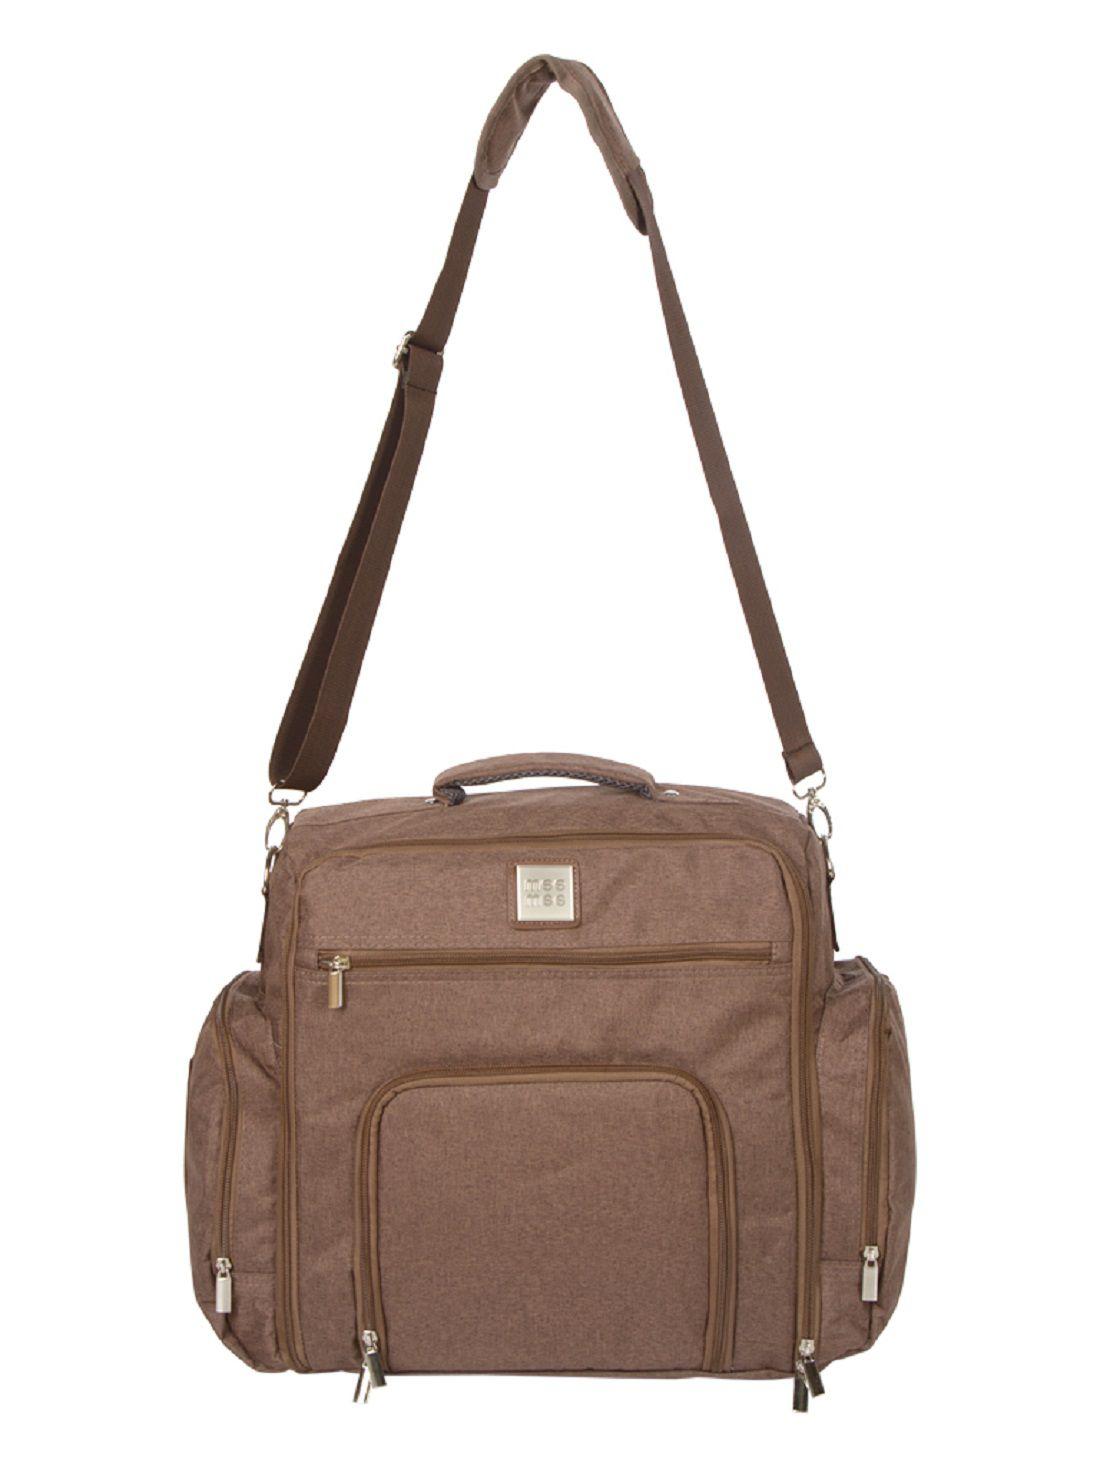 Mee Mee Brown Polyester Diaper Bag   40 cm